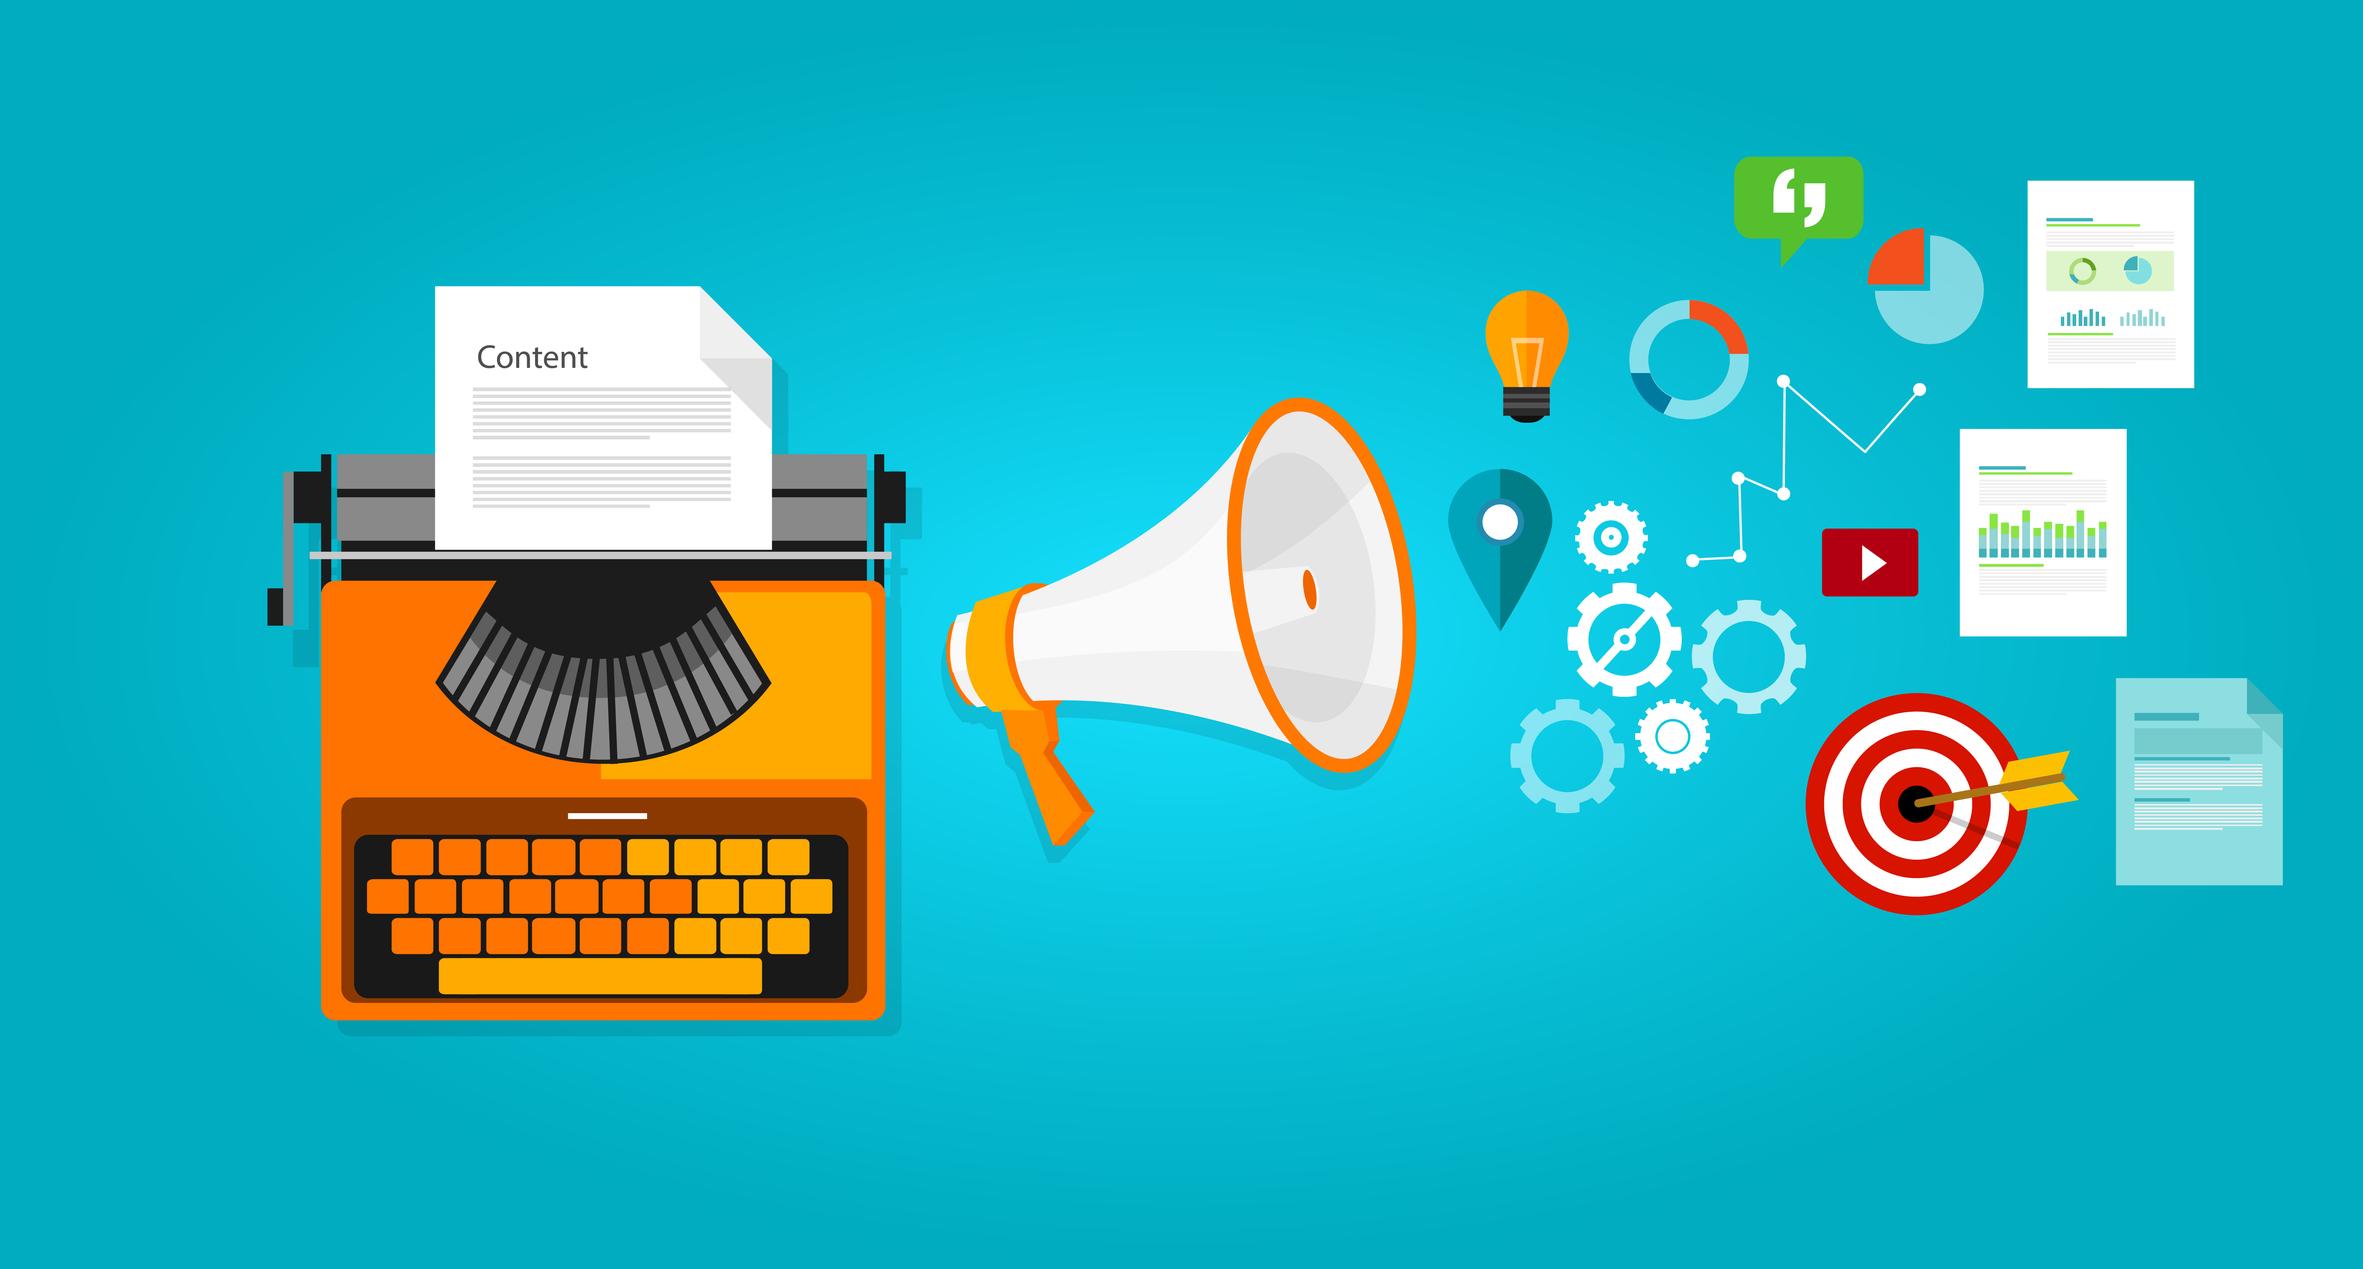 content-marketing-1.jpg